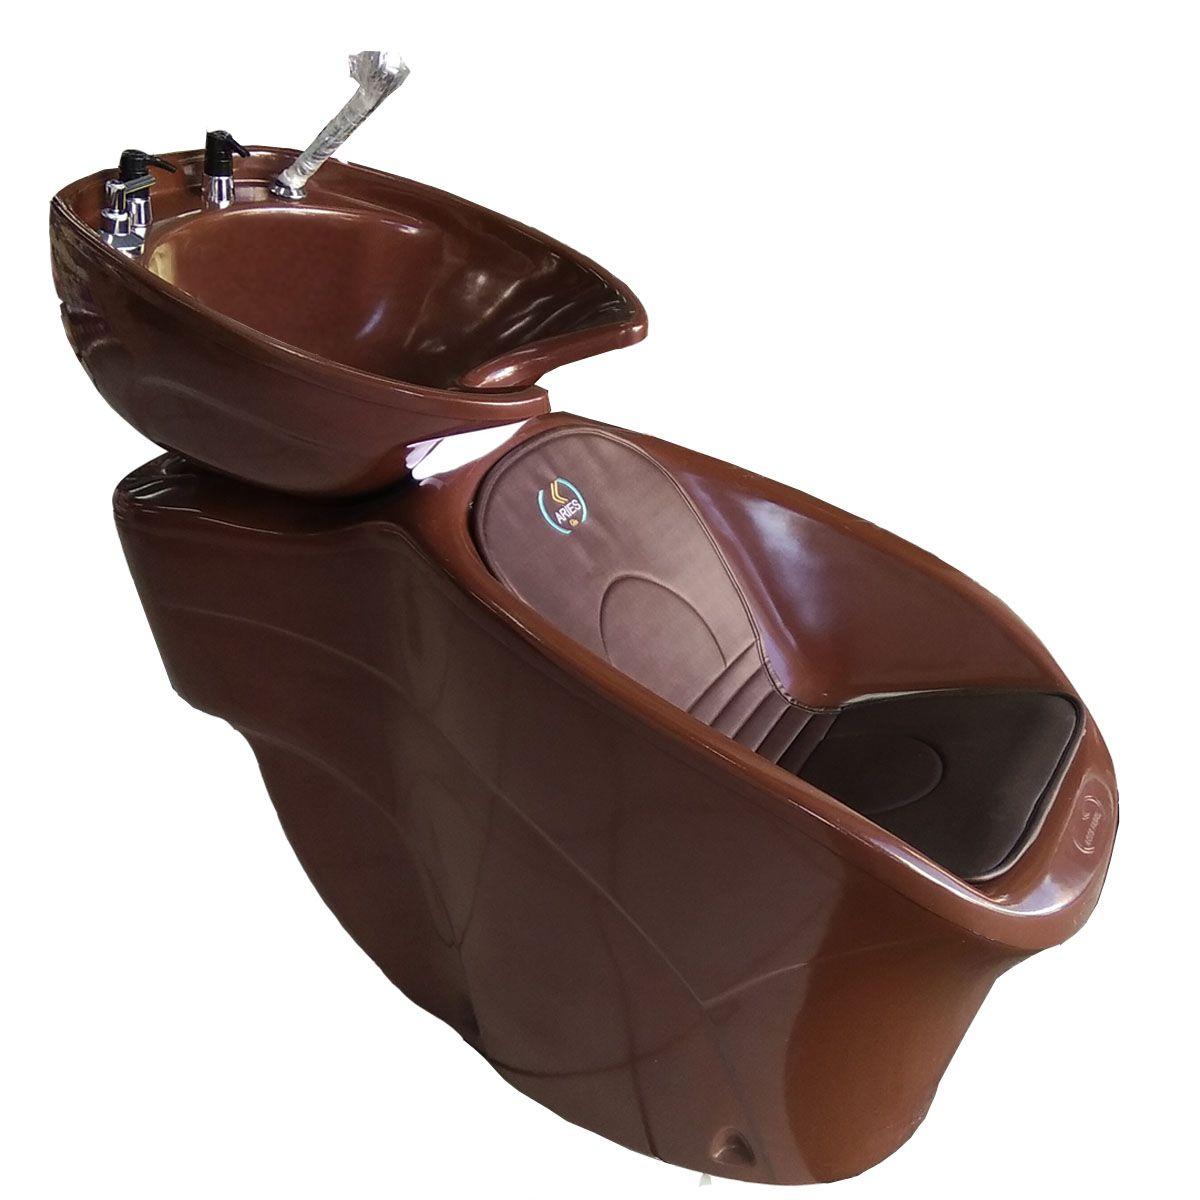 Kit Lavatorio Aries Marrom + Cadeira Futurama Base Aluminio + Carrinho Auxiliar Beauty Tabaco